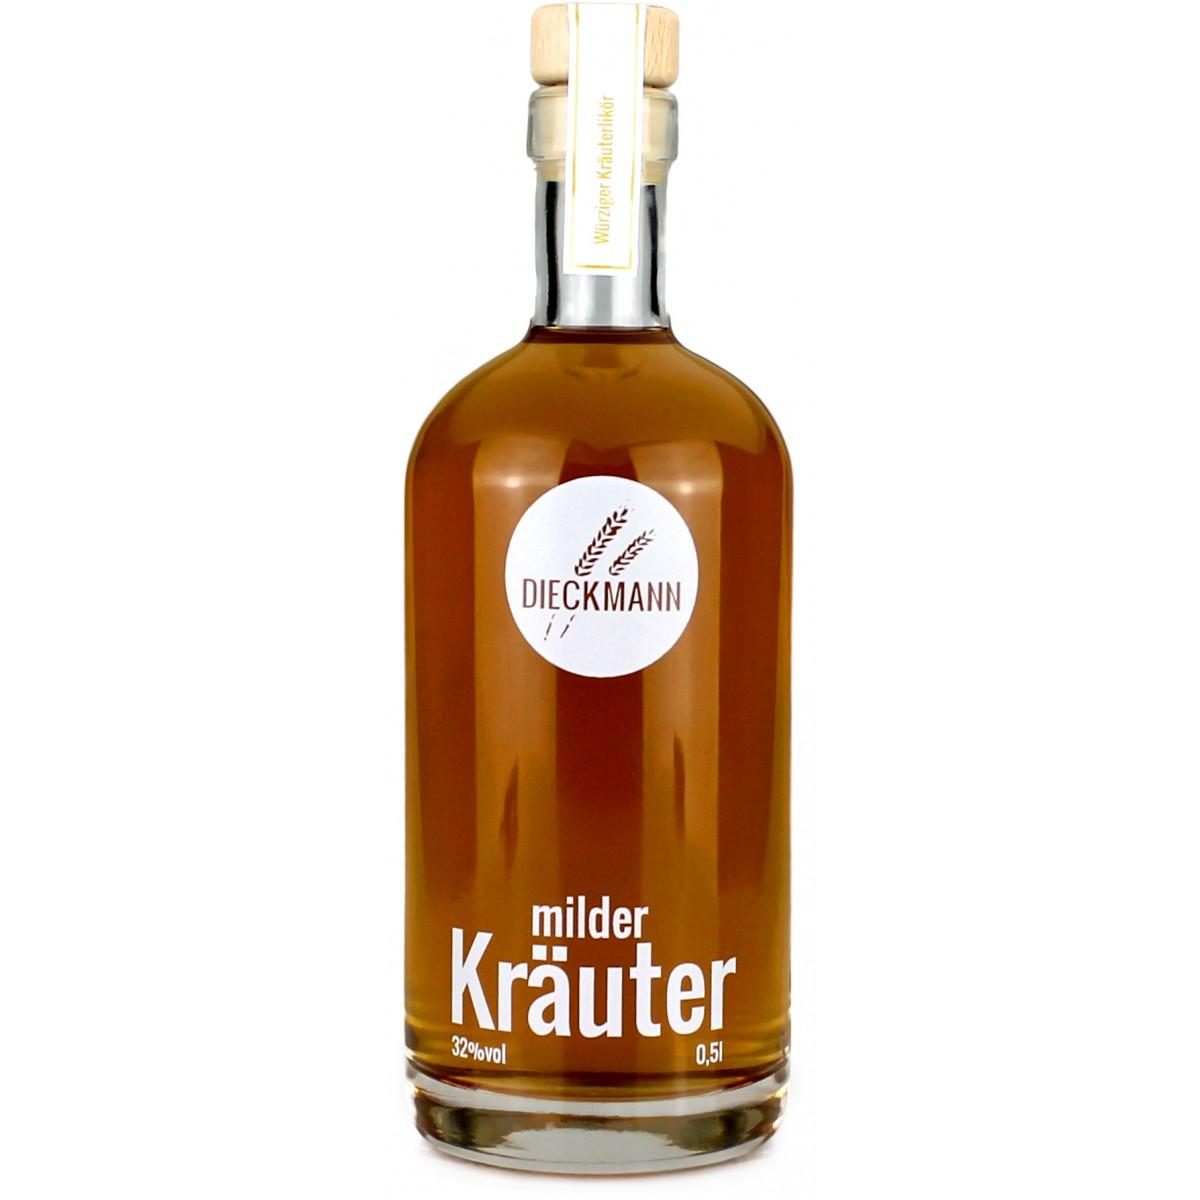 Weizenbrennerei & Likörmanufaktur Dieckmann milder Kräuter - Kräuterlikör LIKÖR 32% vol., 0,5l